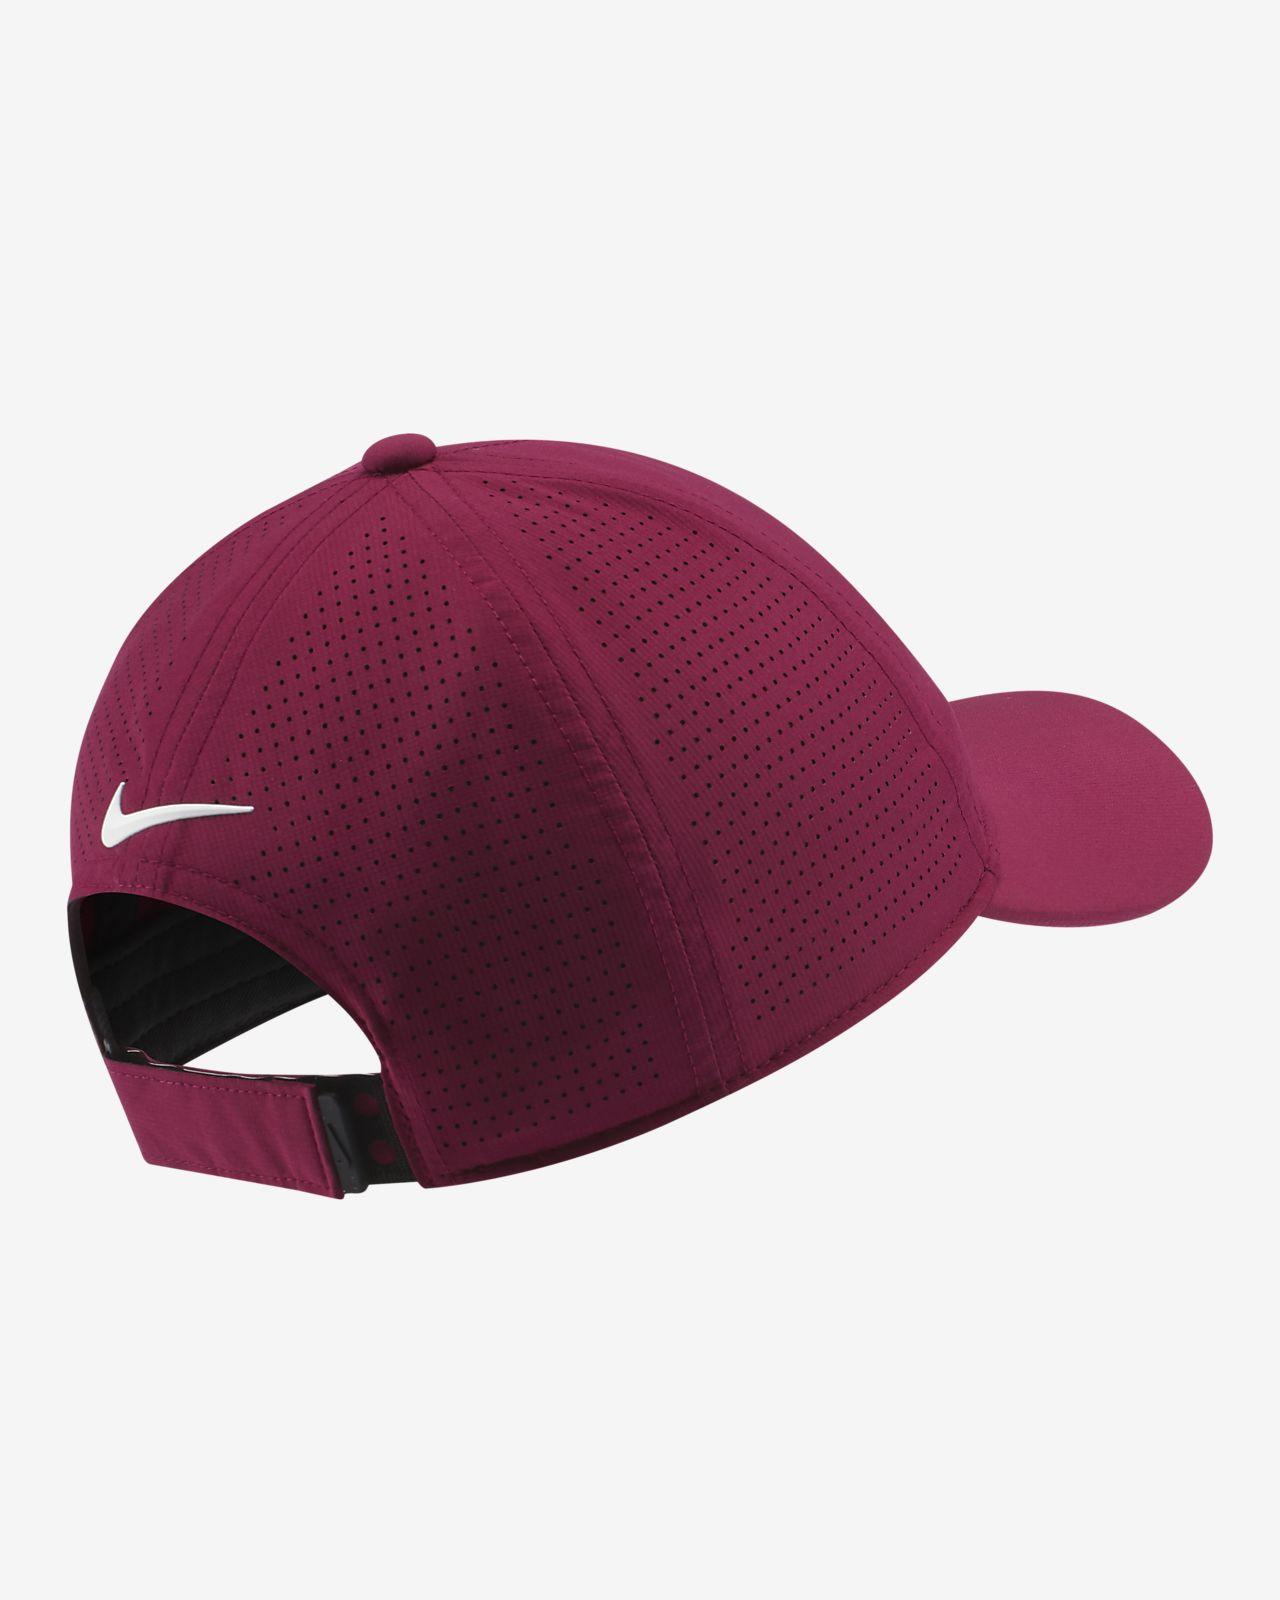 cb4068aa65e Nike AeroBill Legacy91 Women s Golf Hat. Nike.com